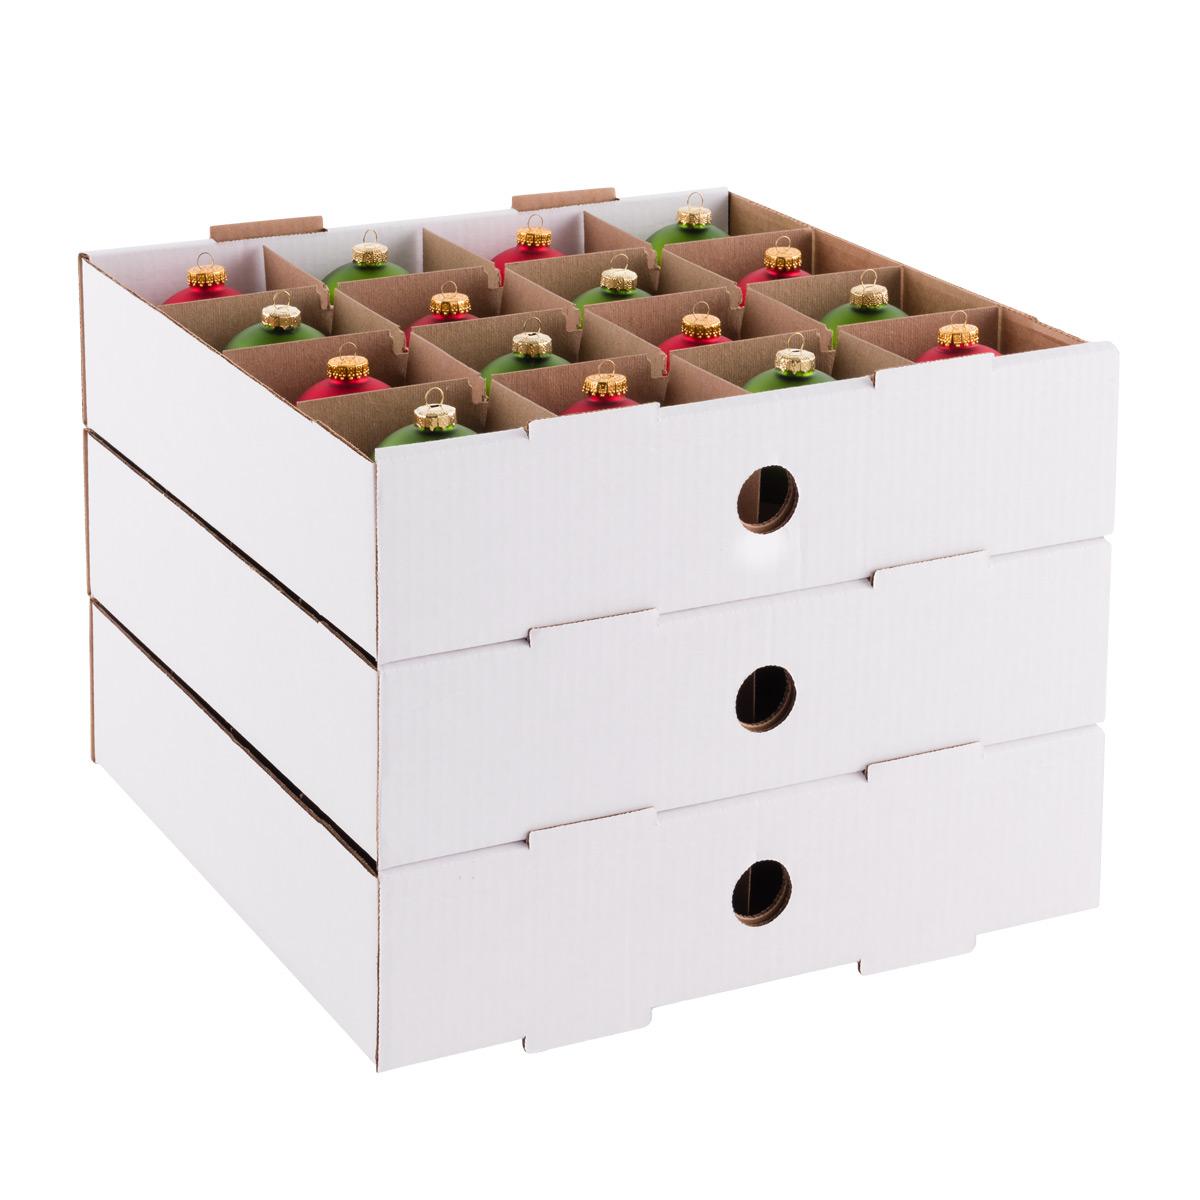 Ornament Storage Tray